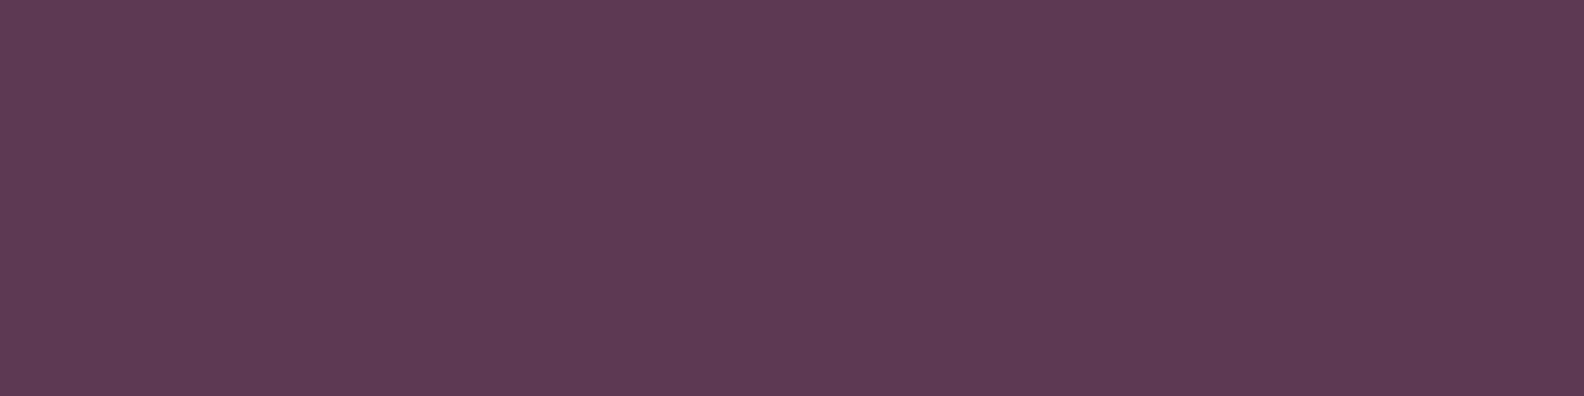 1584x396 Dark Byzantium Solid Color Background